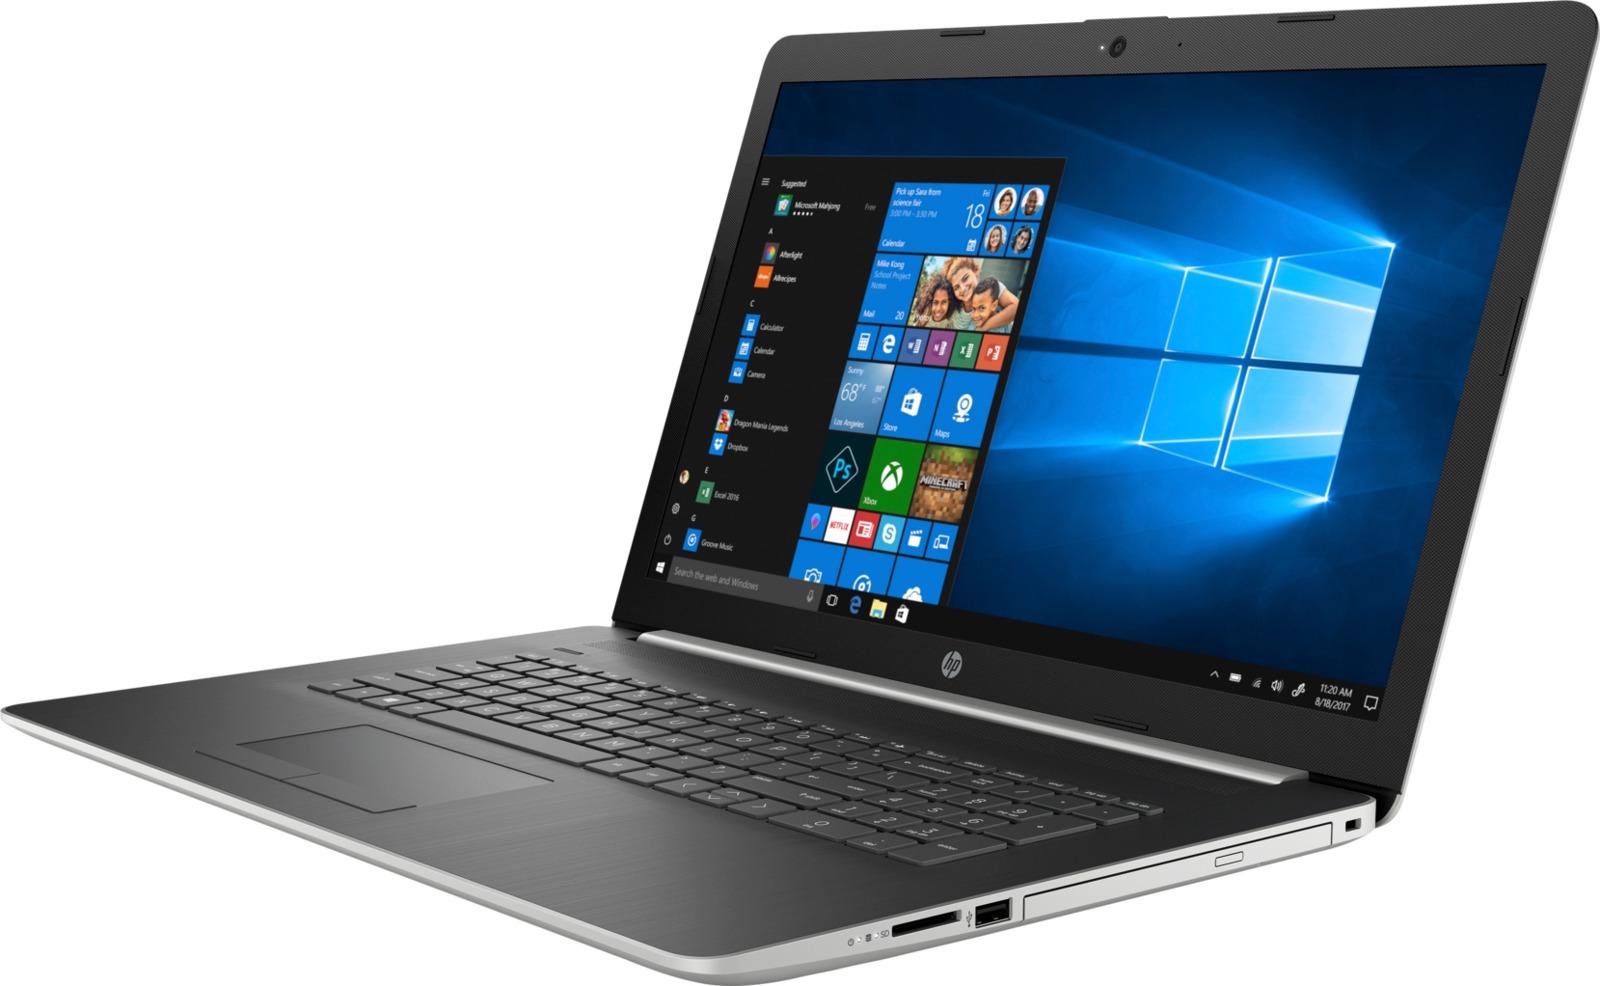 цена на 17.3 Ноутбук HP 17-by0019ur 4KH59EA, серебристый